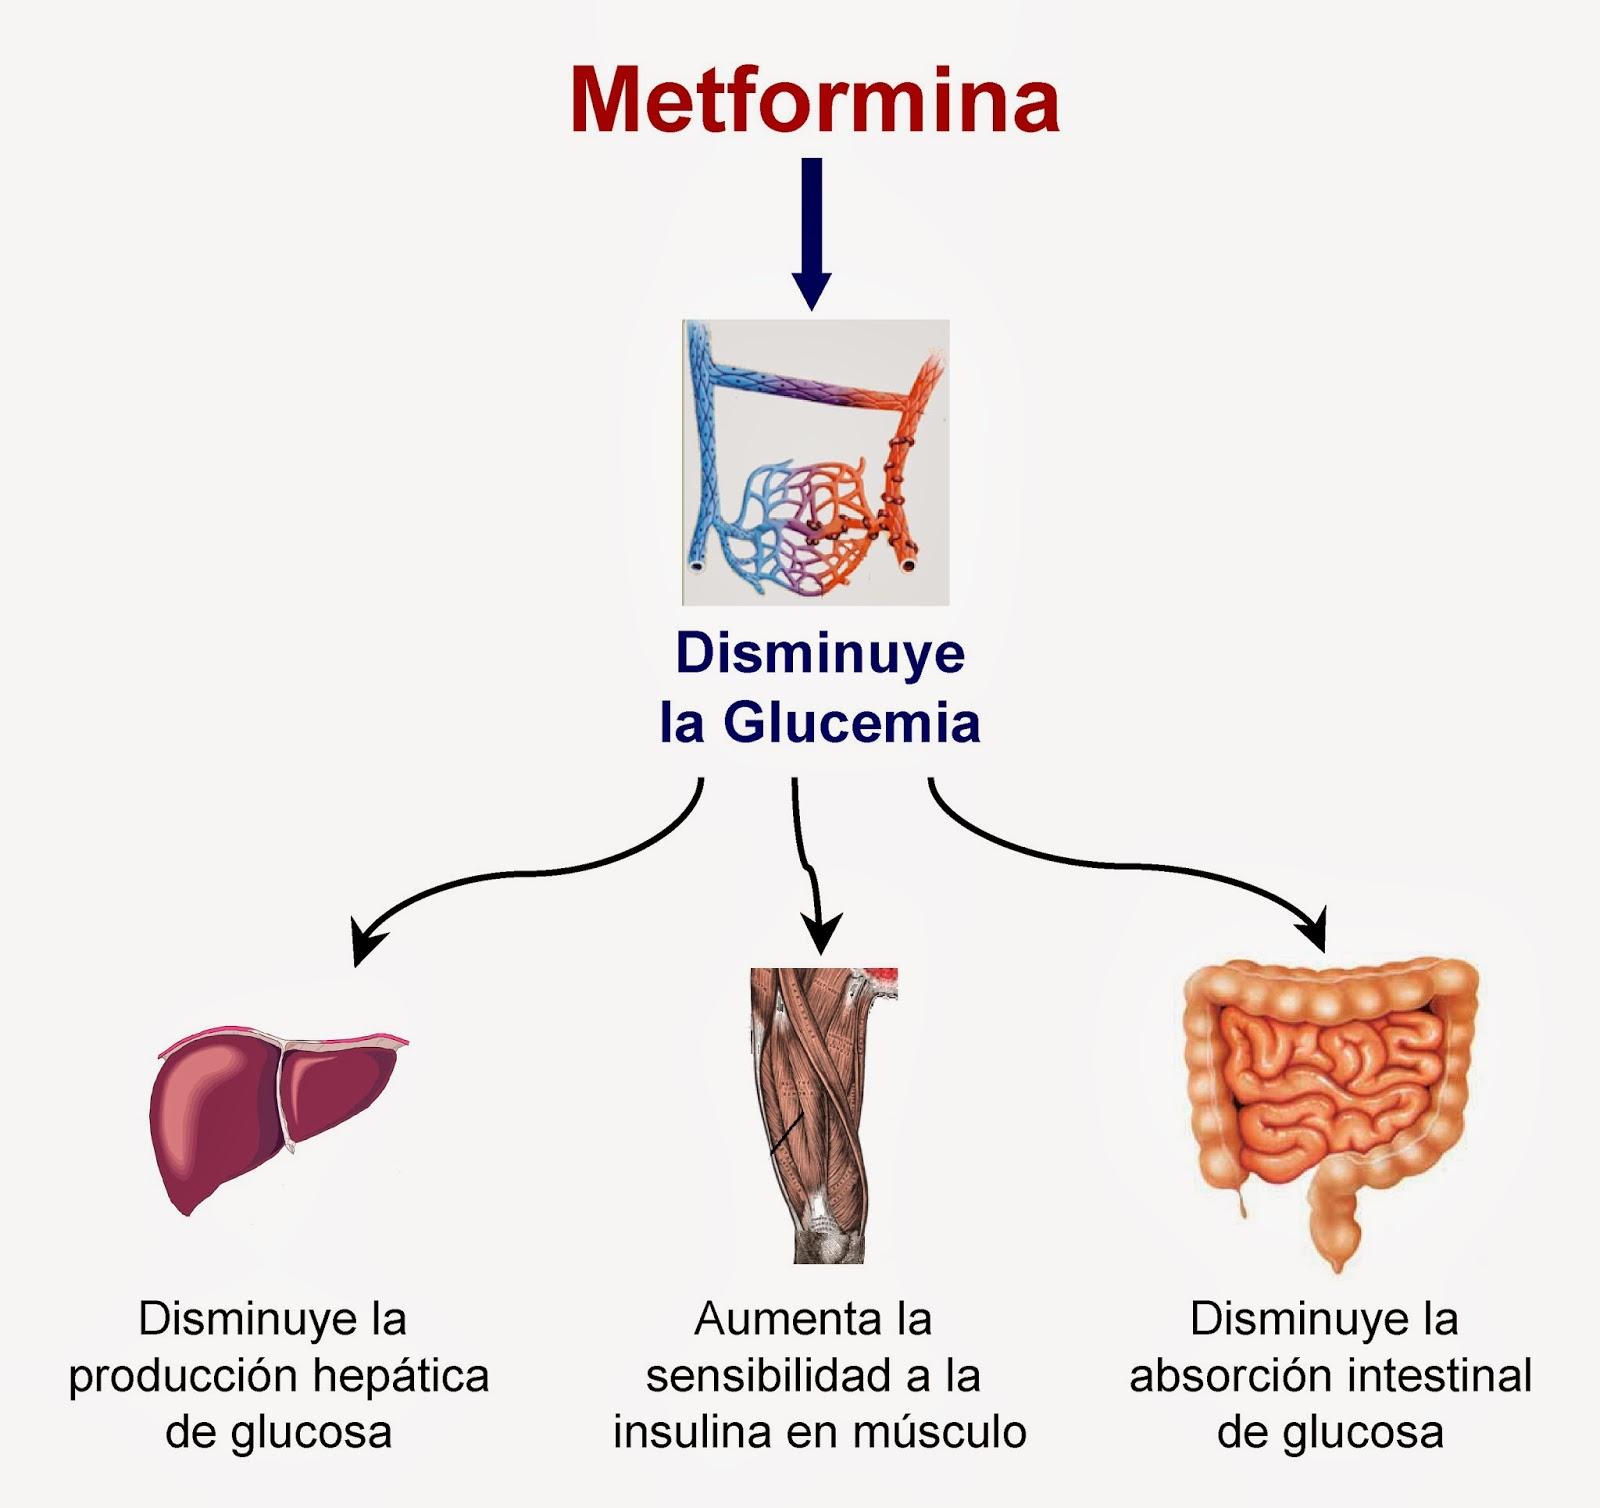 Mecanismo de la metformina para disminuir la glucemia